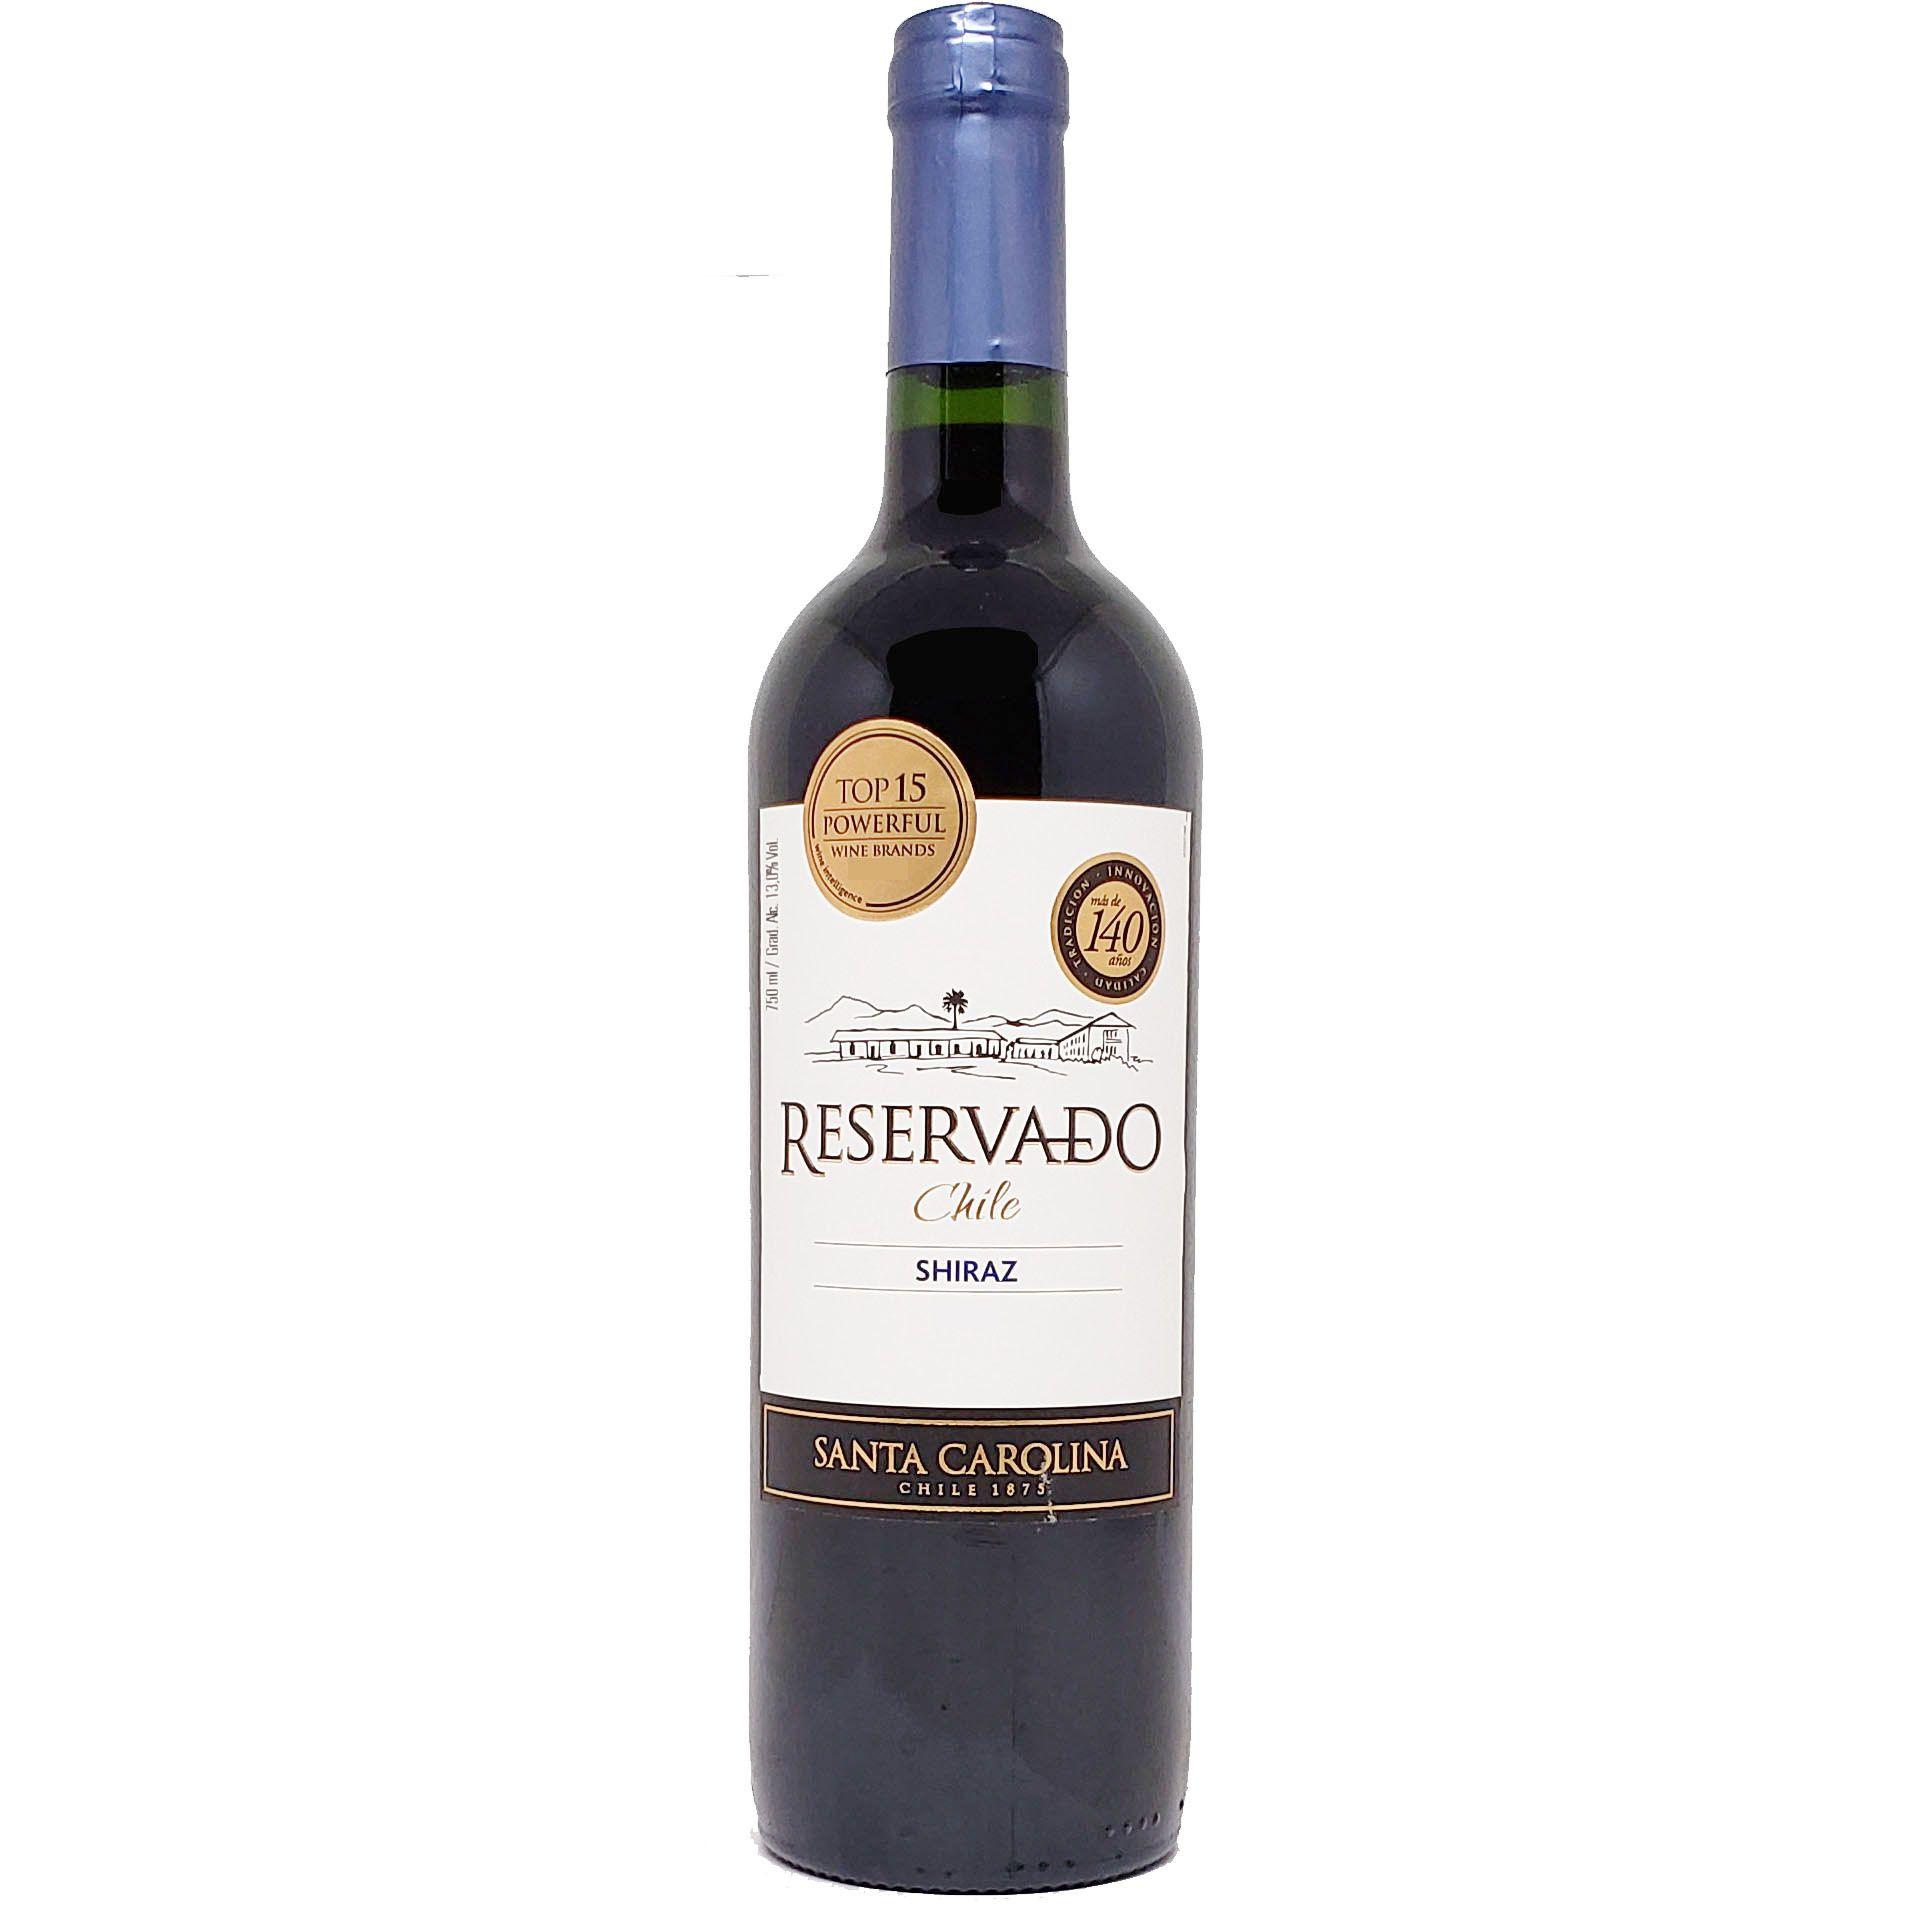 Vinho Tinto Reservado Shiraz Santa Carolina - 750ml -